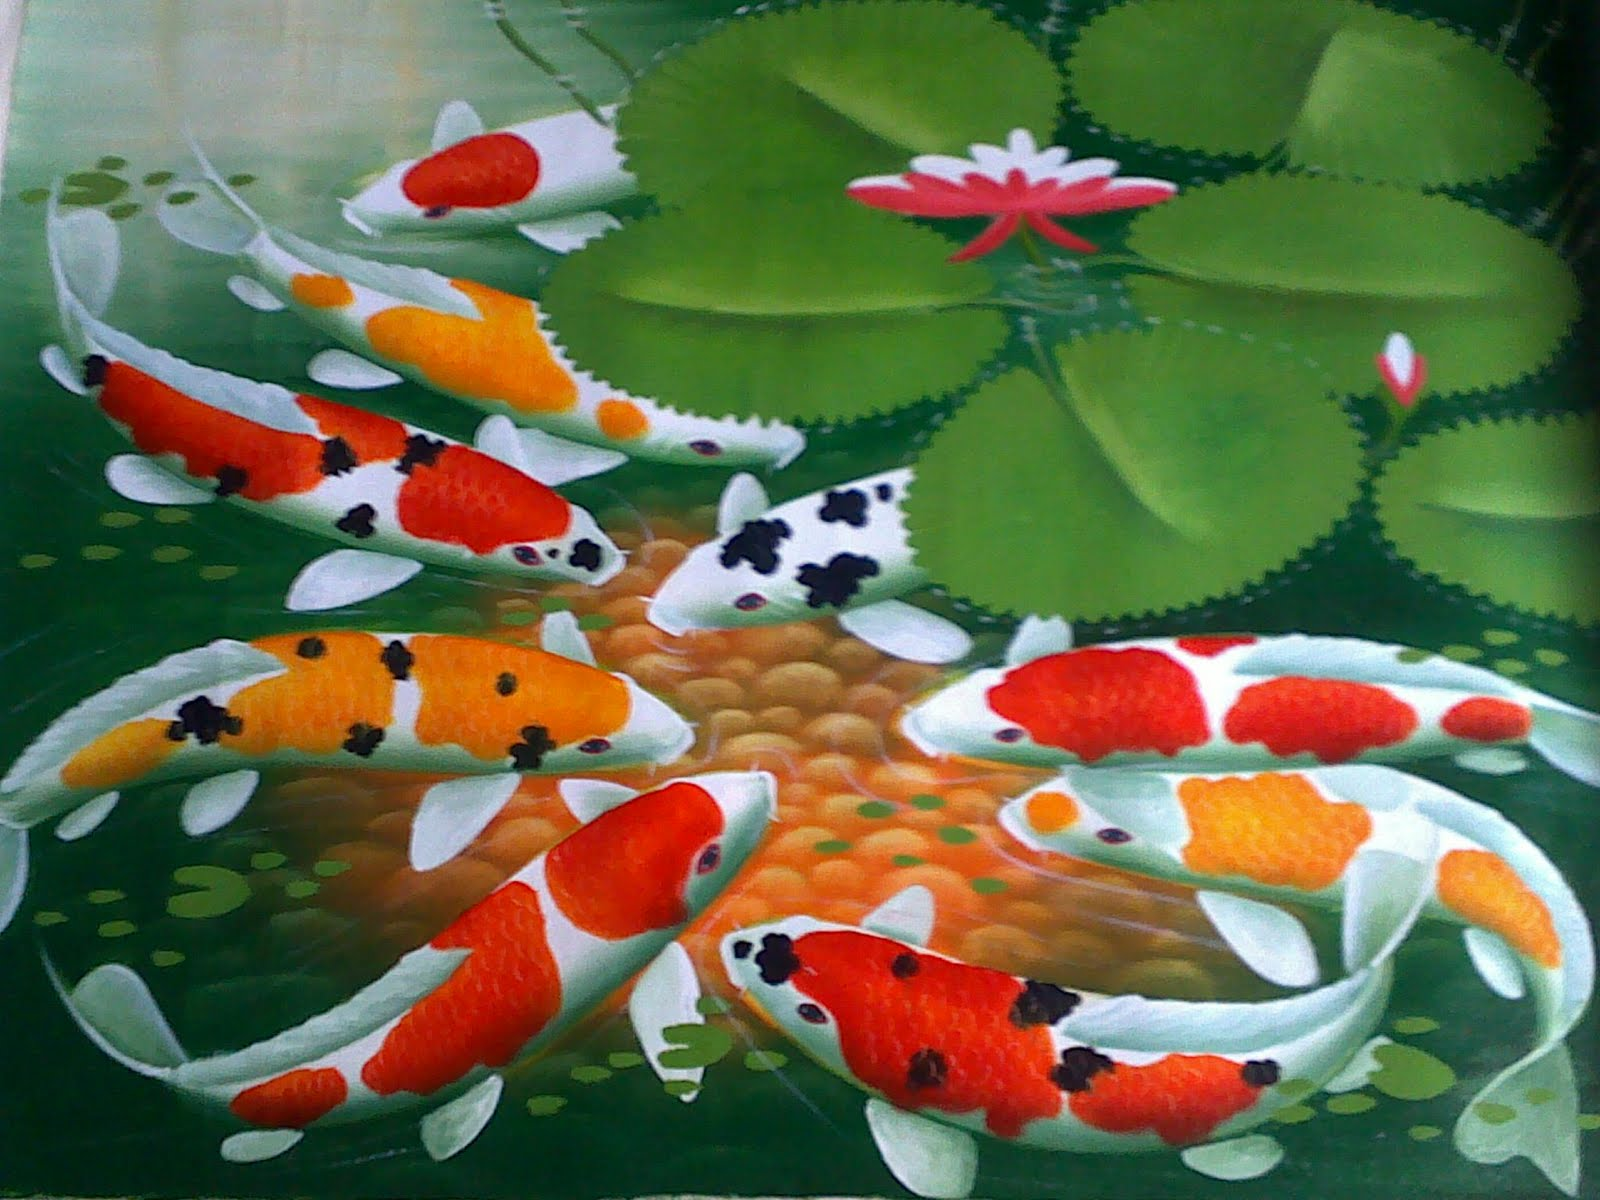 kuya batok: koi fish